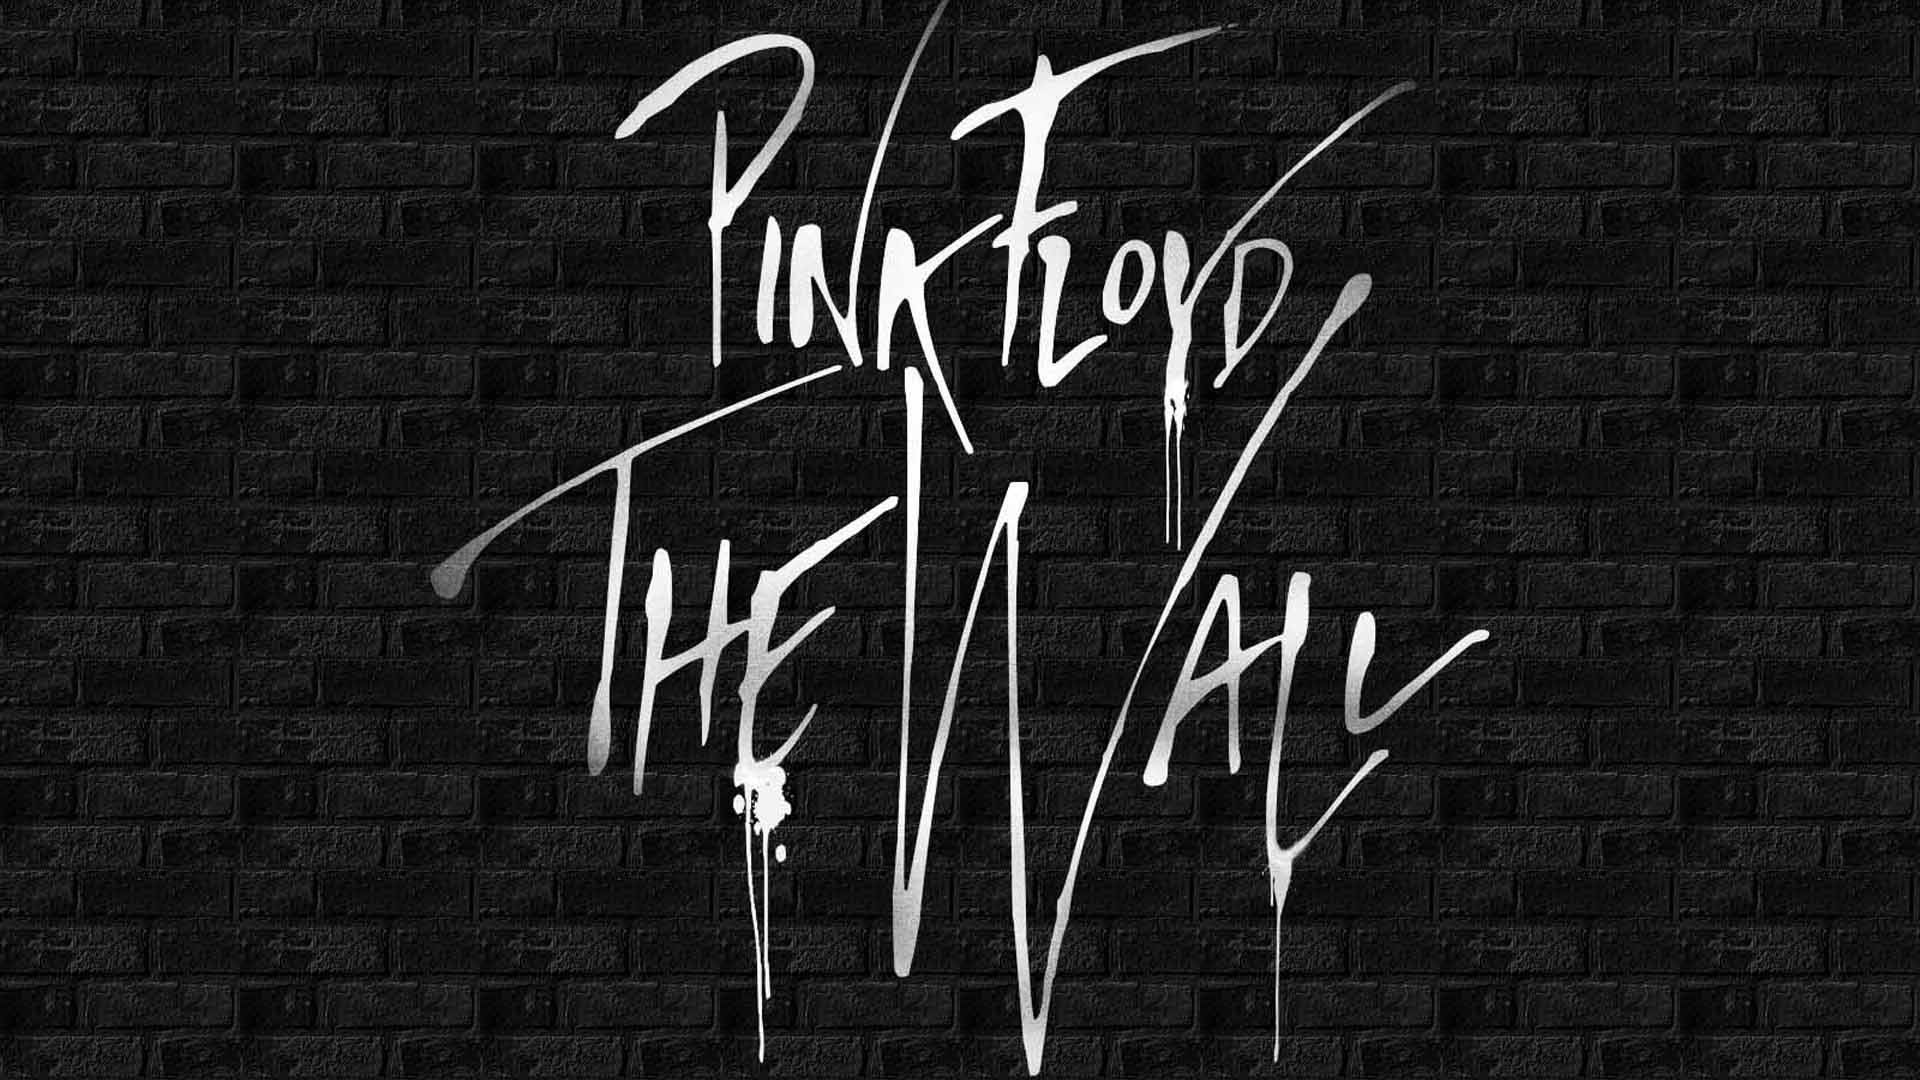 Pink Floyd The Wall Wallpaper Wallpapertag